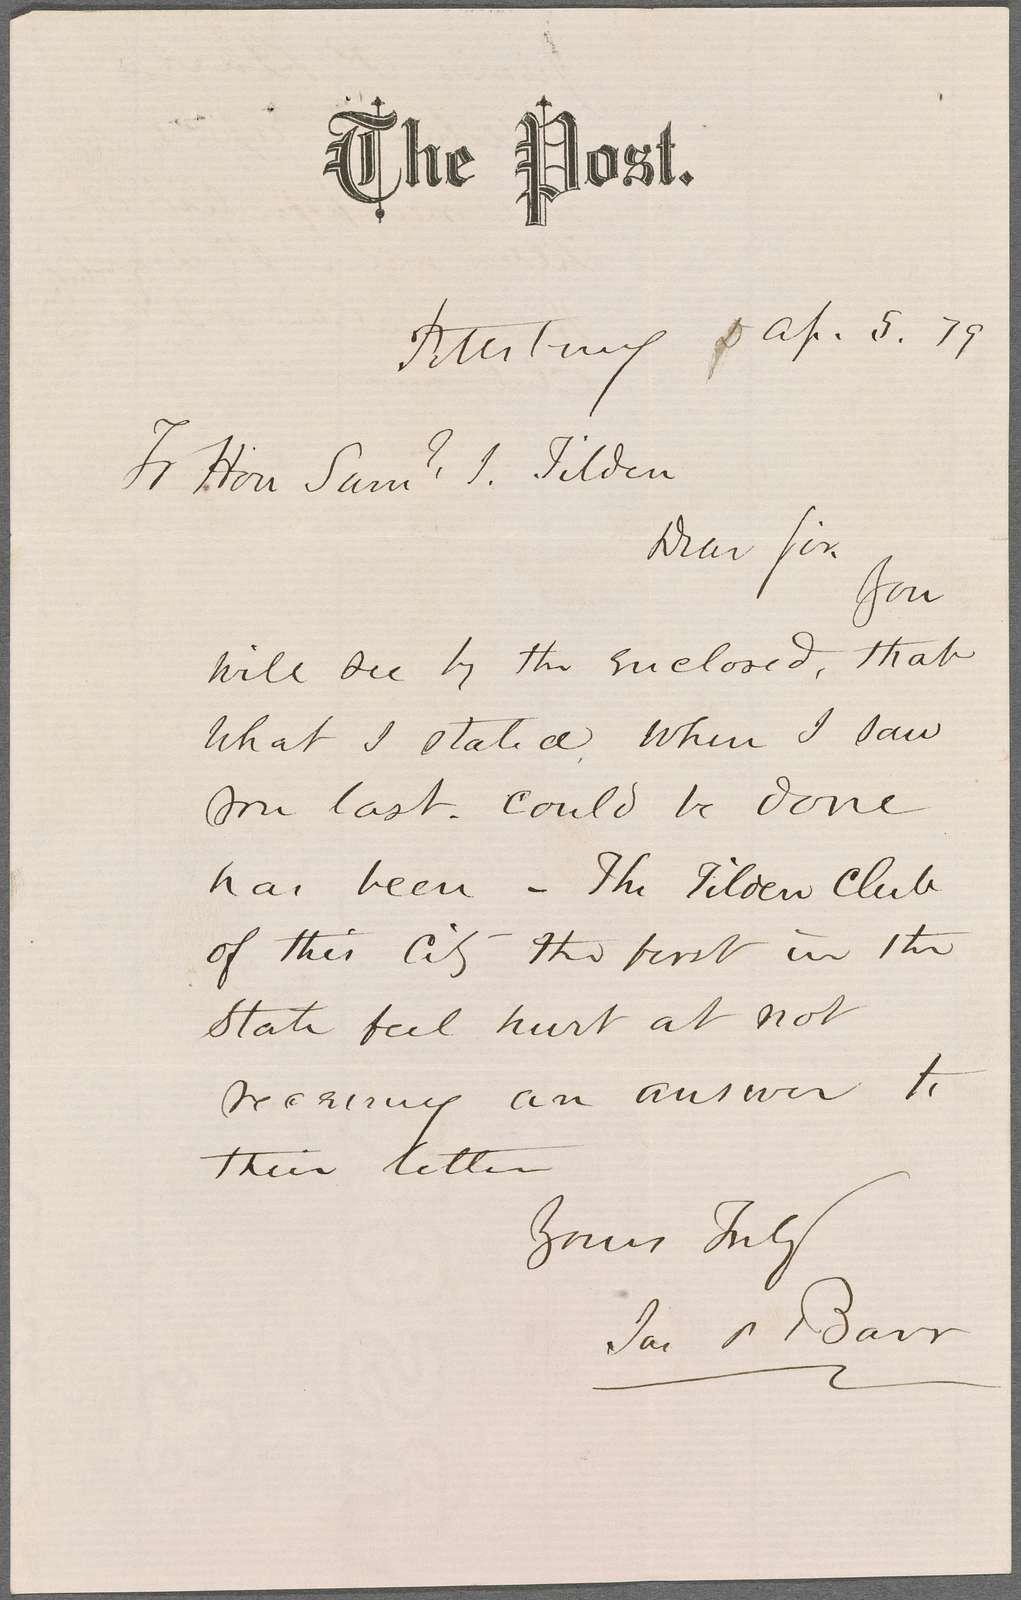 Barr, James P., 1879